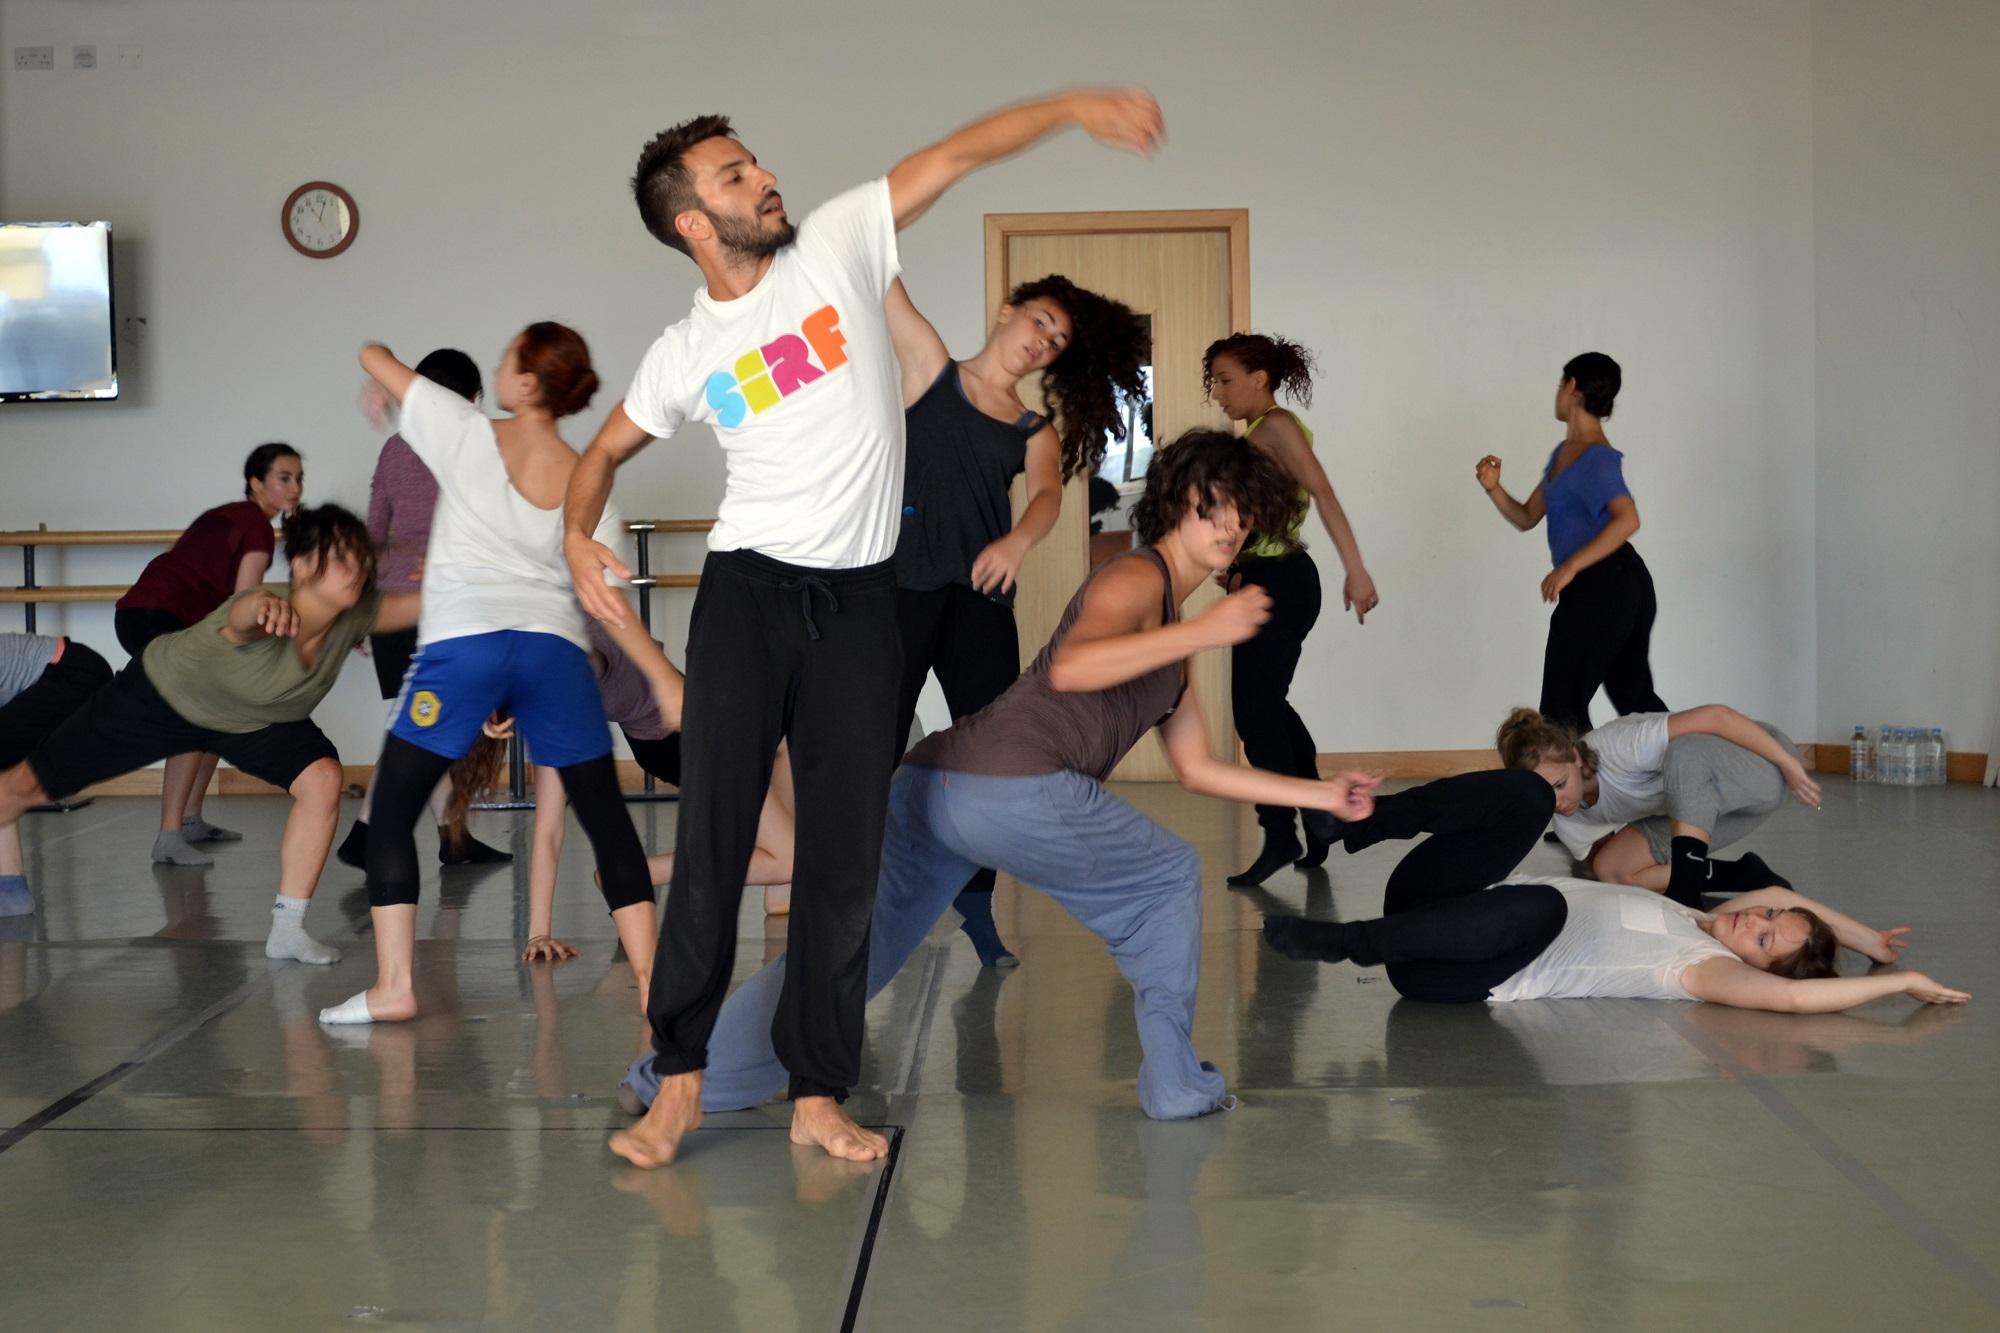 ŻfinMalta dancer Kostas Papamatthaiakis leading the improvisational part of the session.